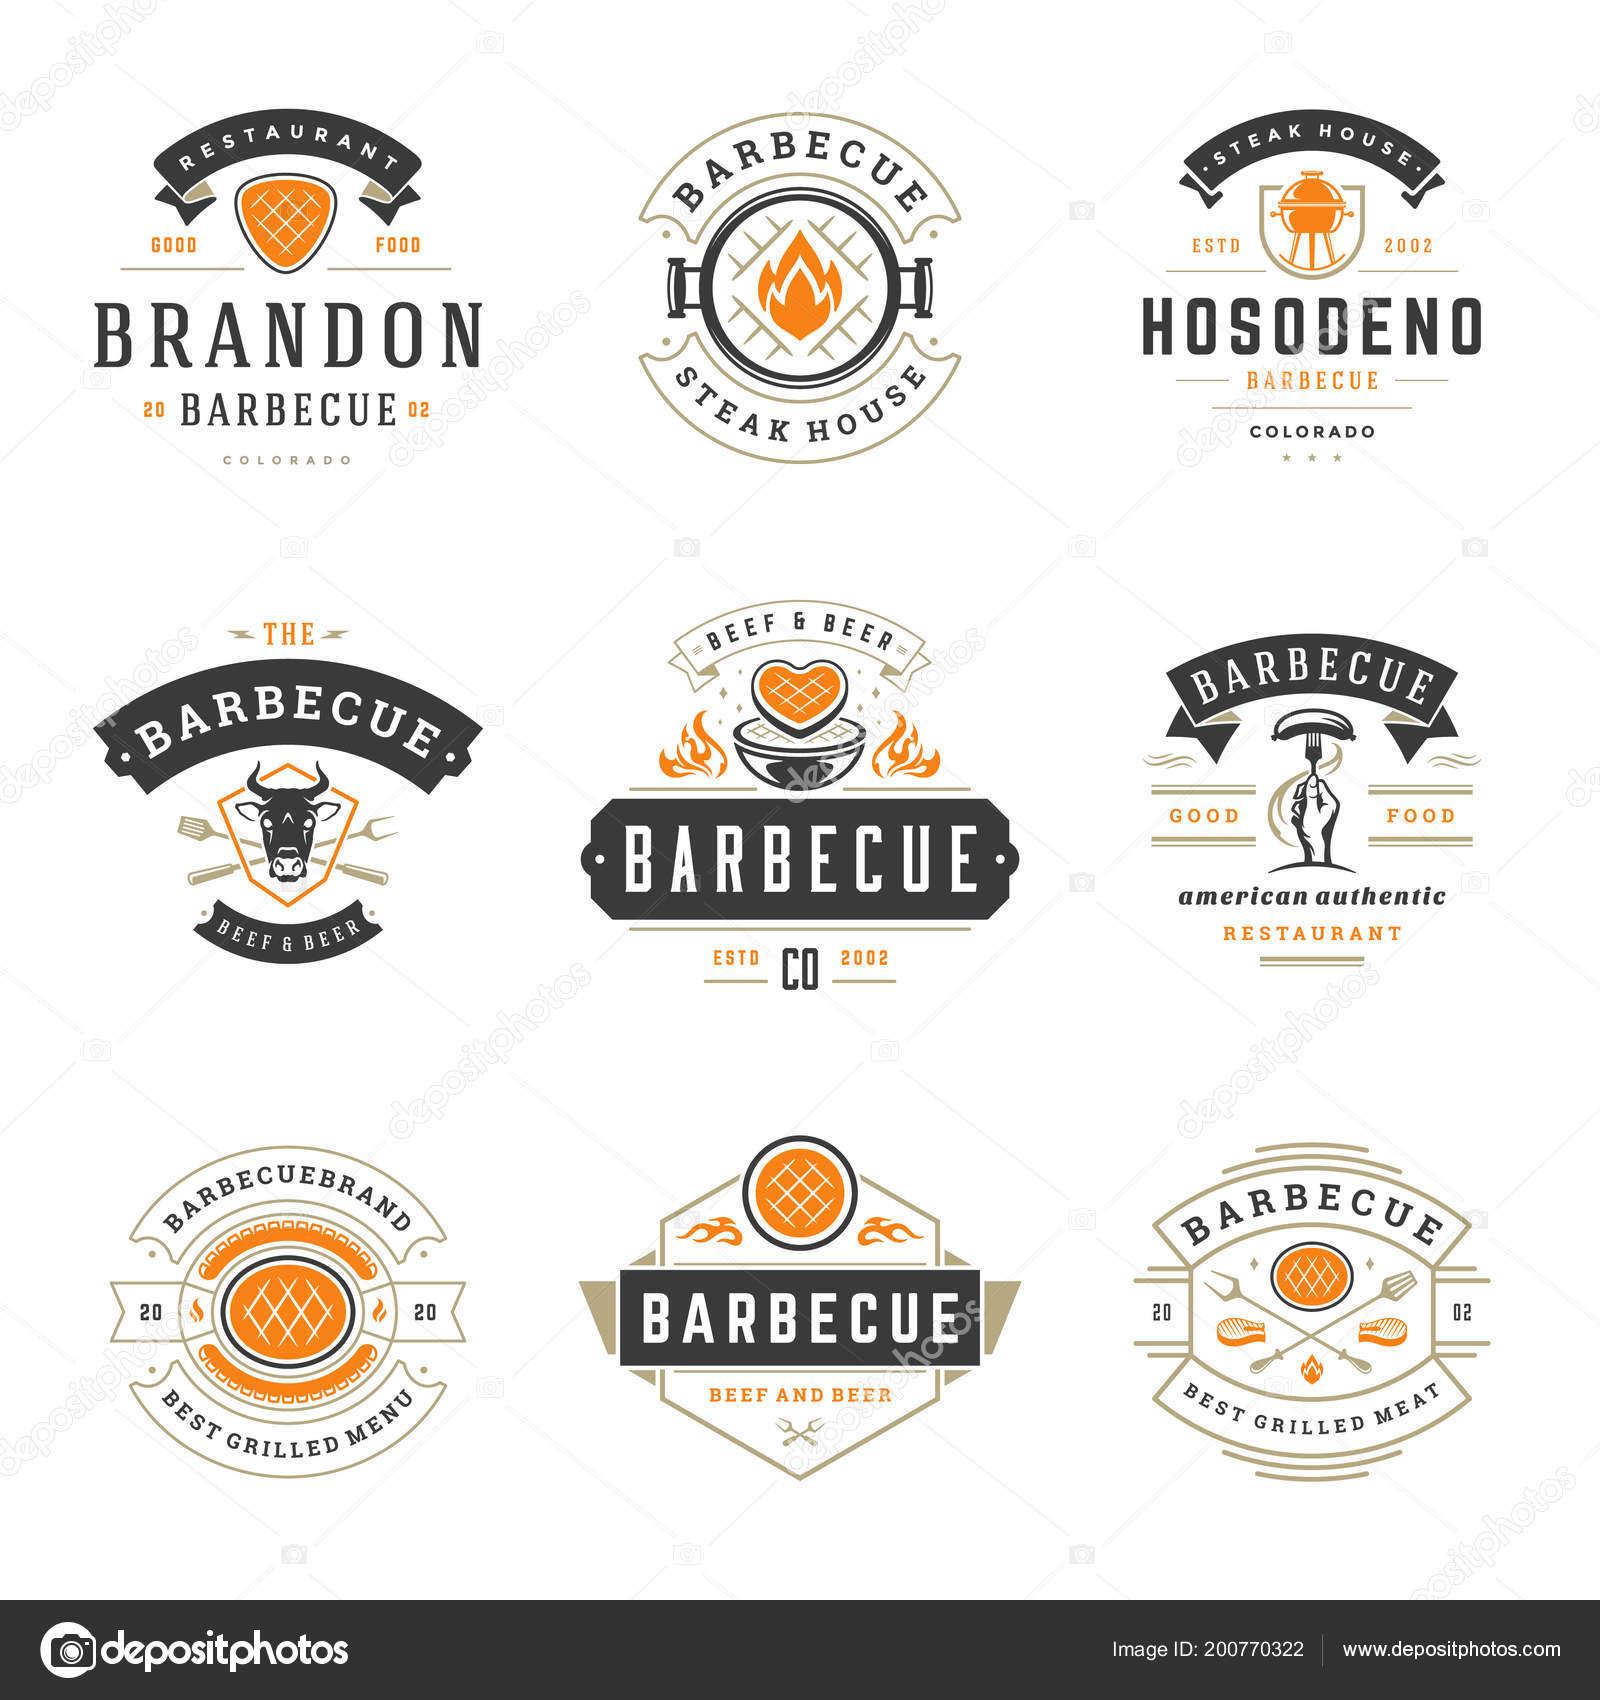 Restaurant Logos With A House Grill Restaurant Logos